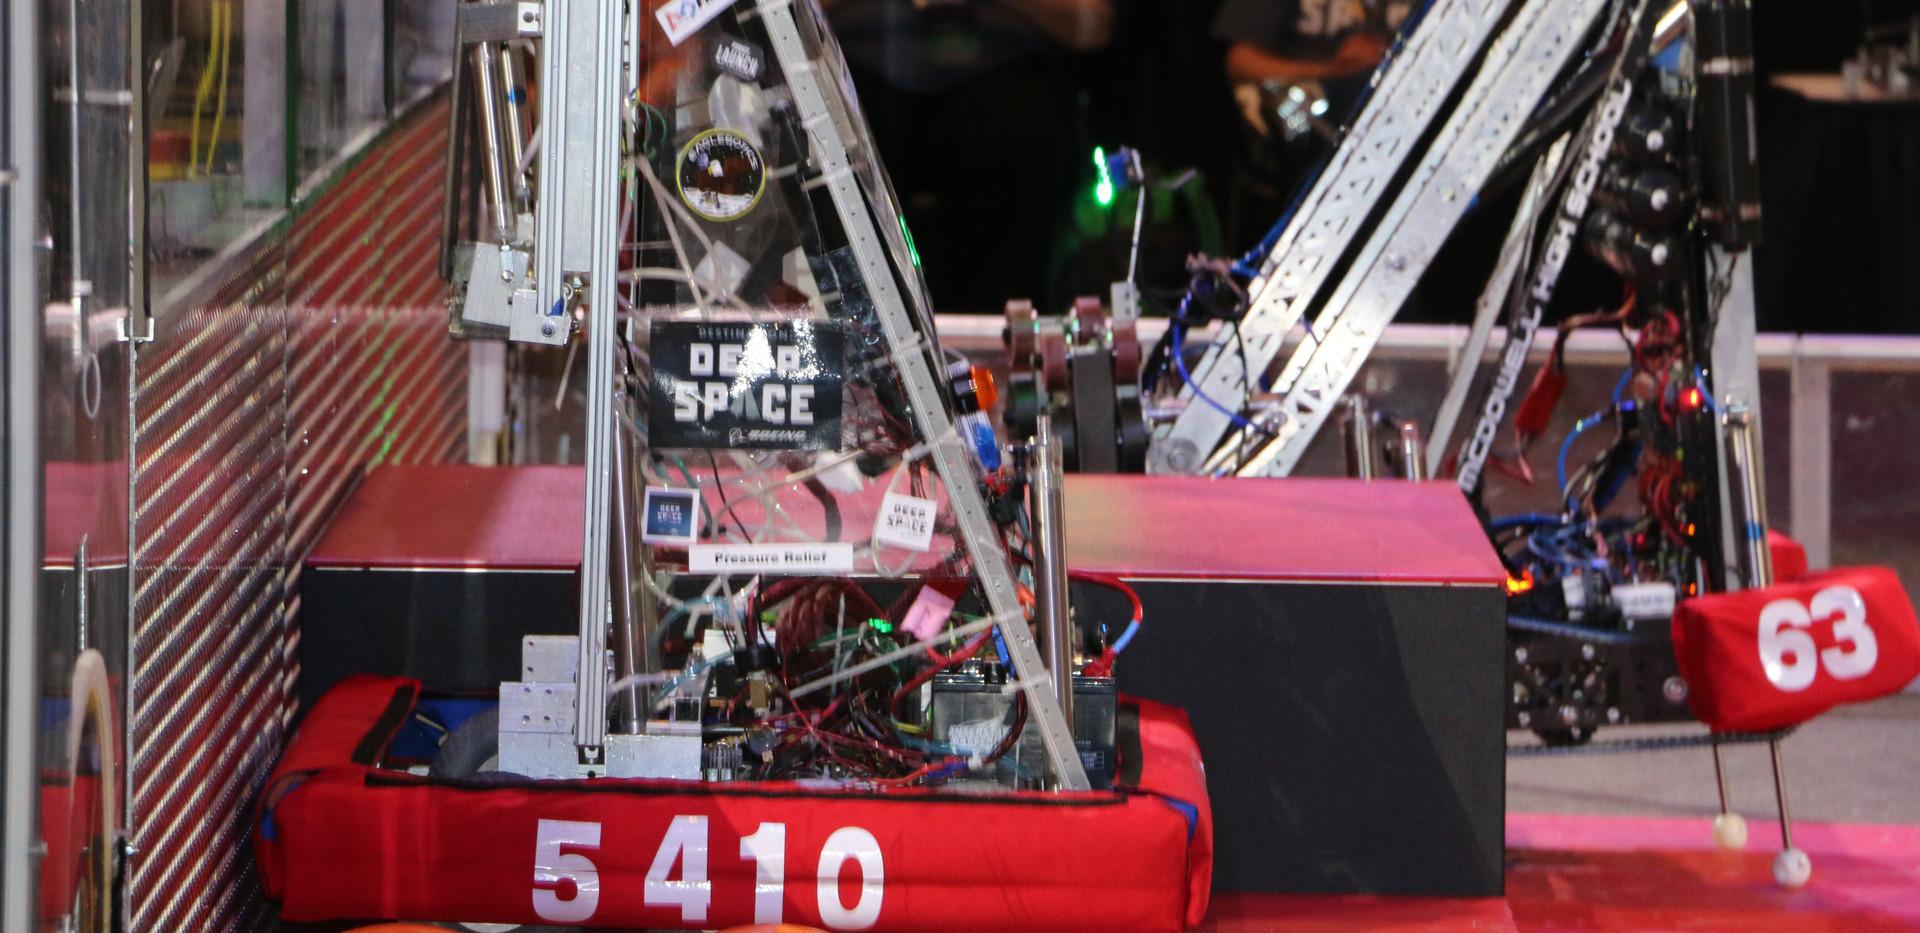 Robot in Habitat.JPG